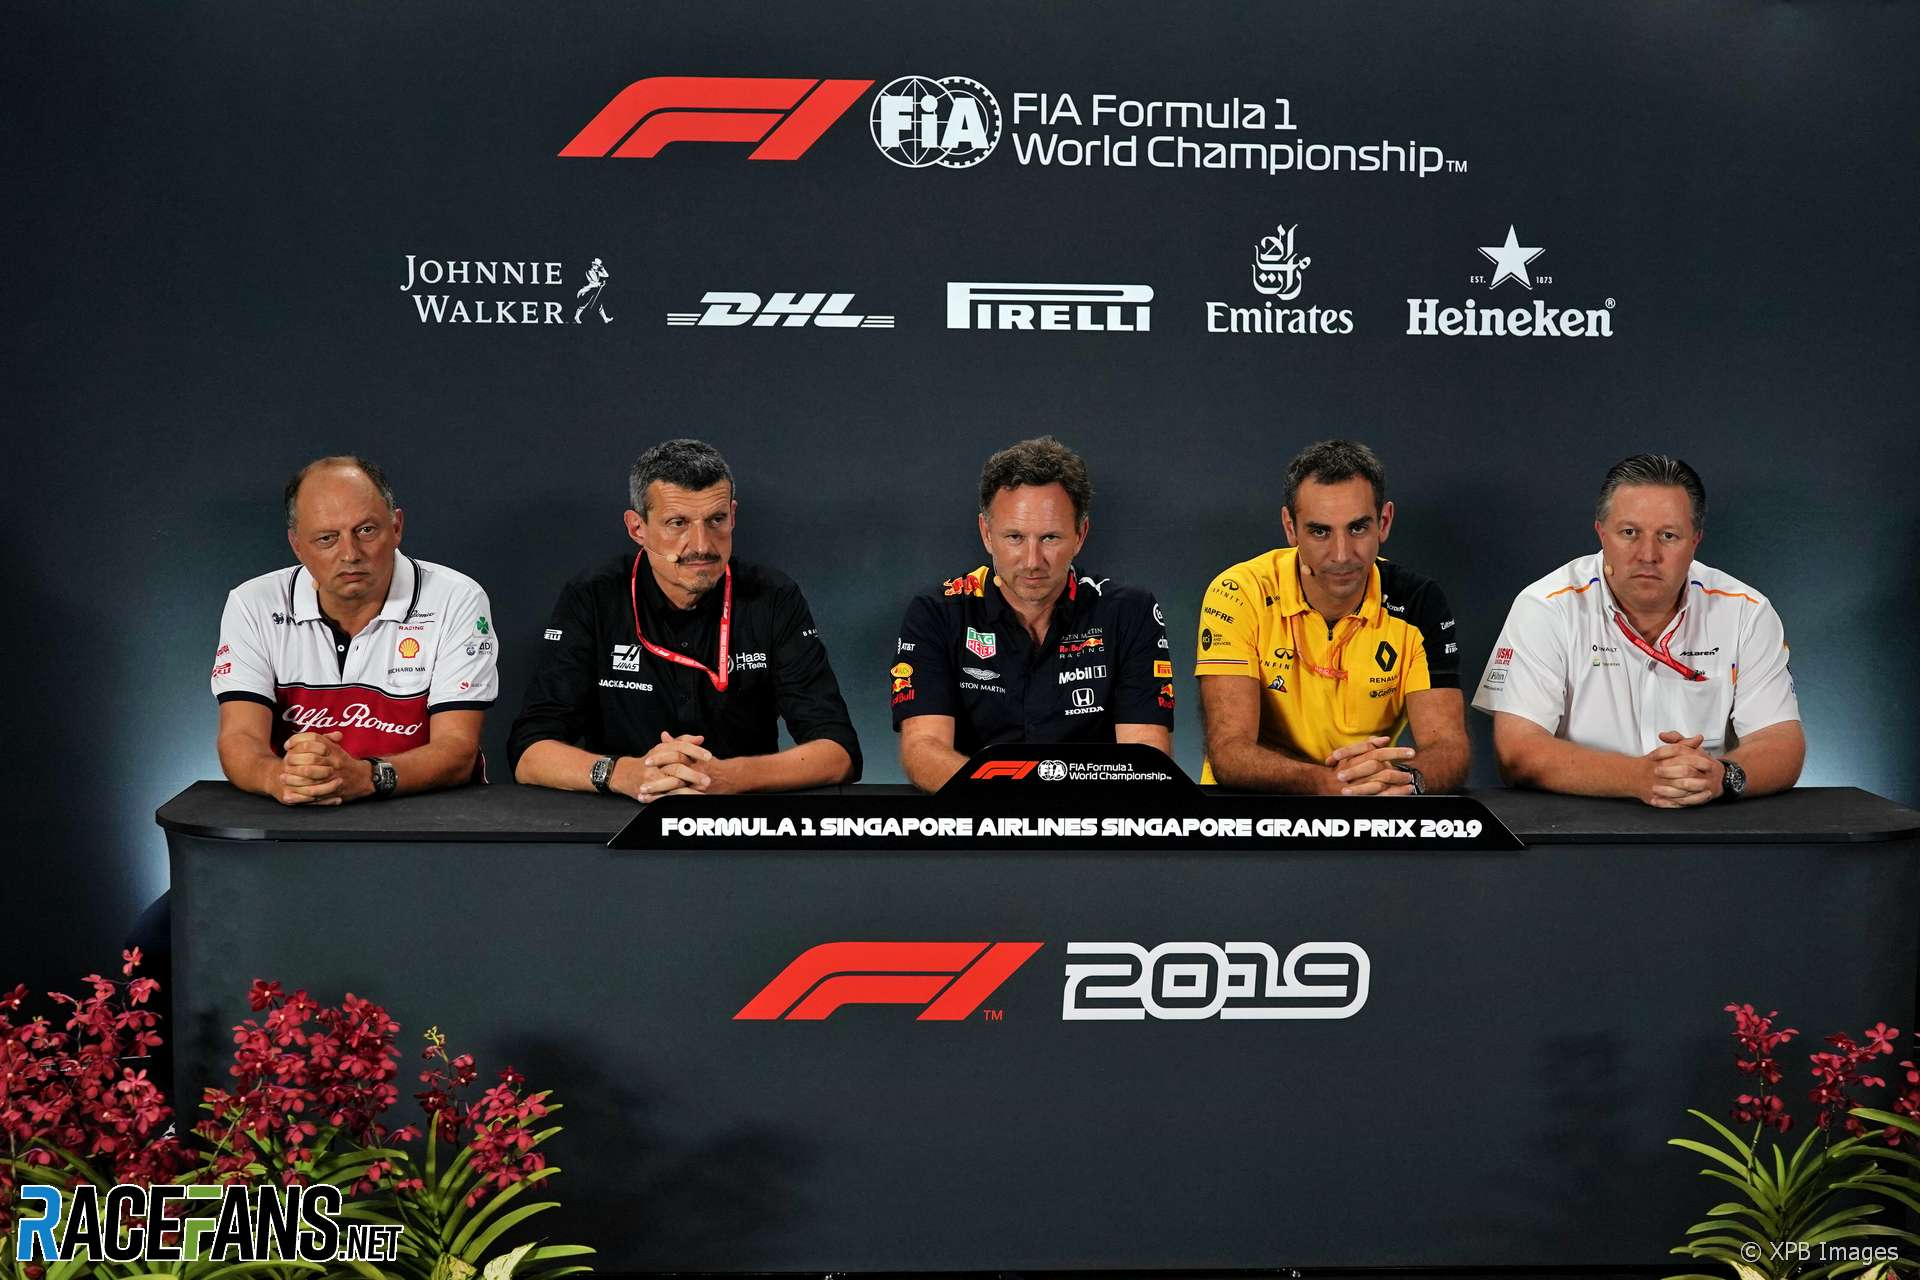 Frederic Vasseur, Guenther Steiner, Christian Horner, Cyril Abiteboul, Zak Brown, Singapore, 2019